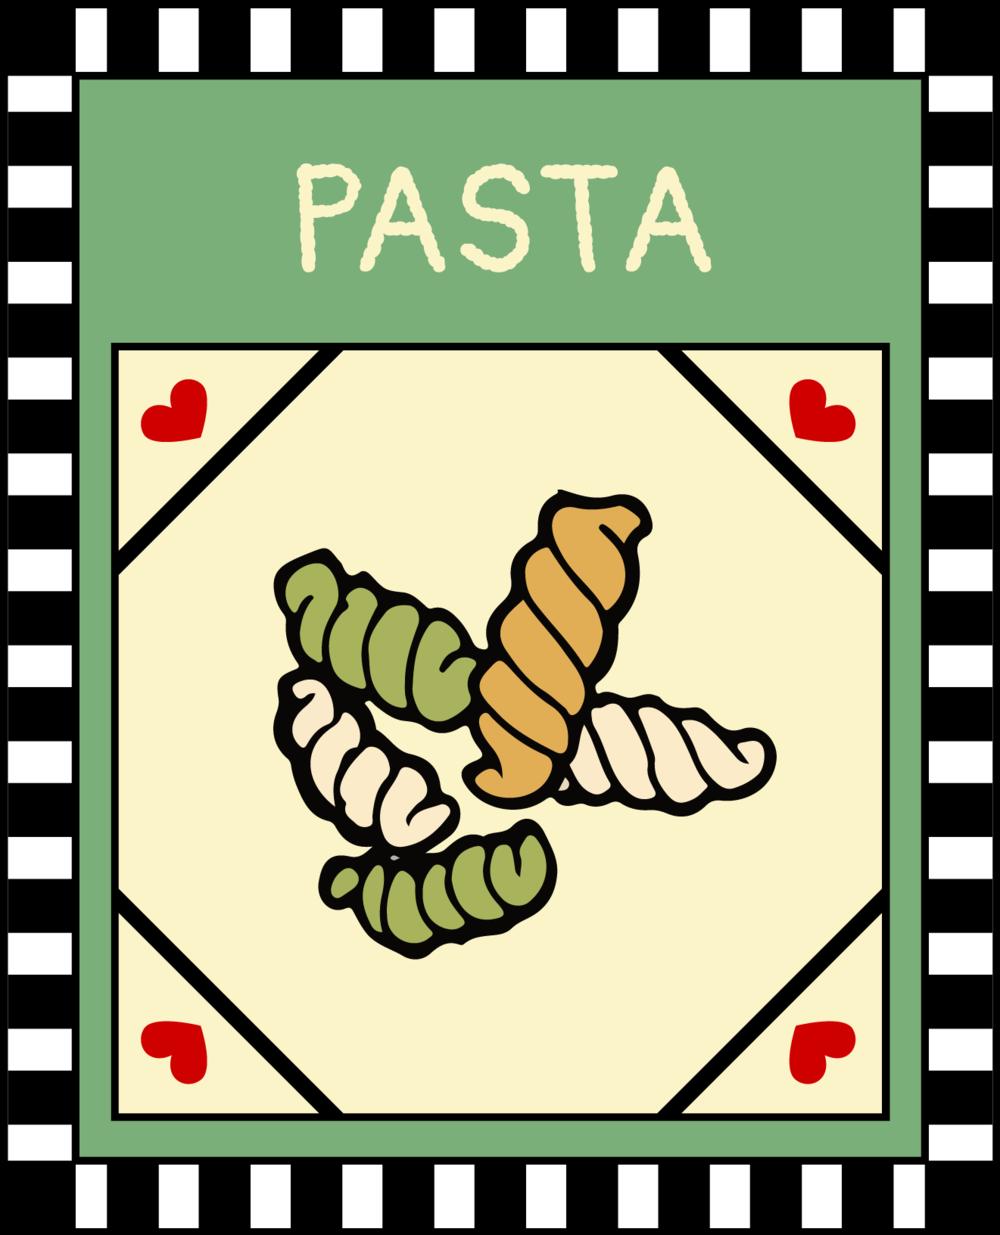 Pasta / Macroni